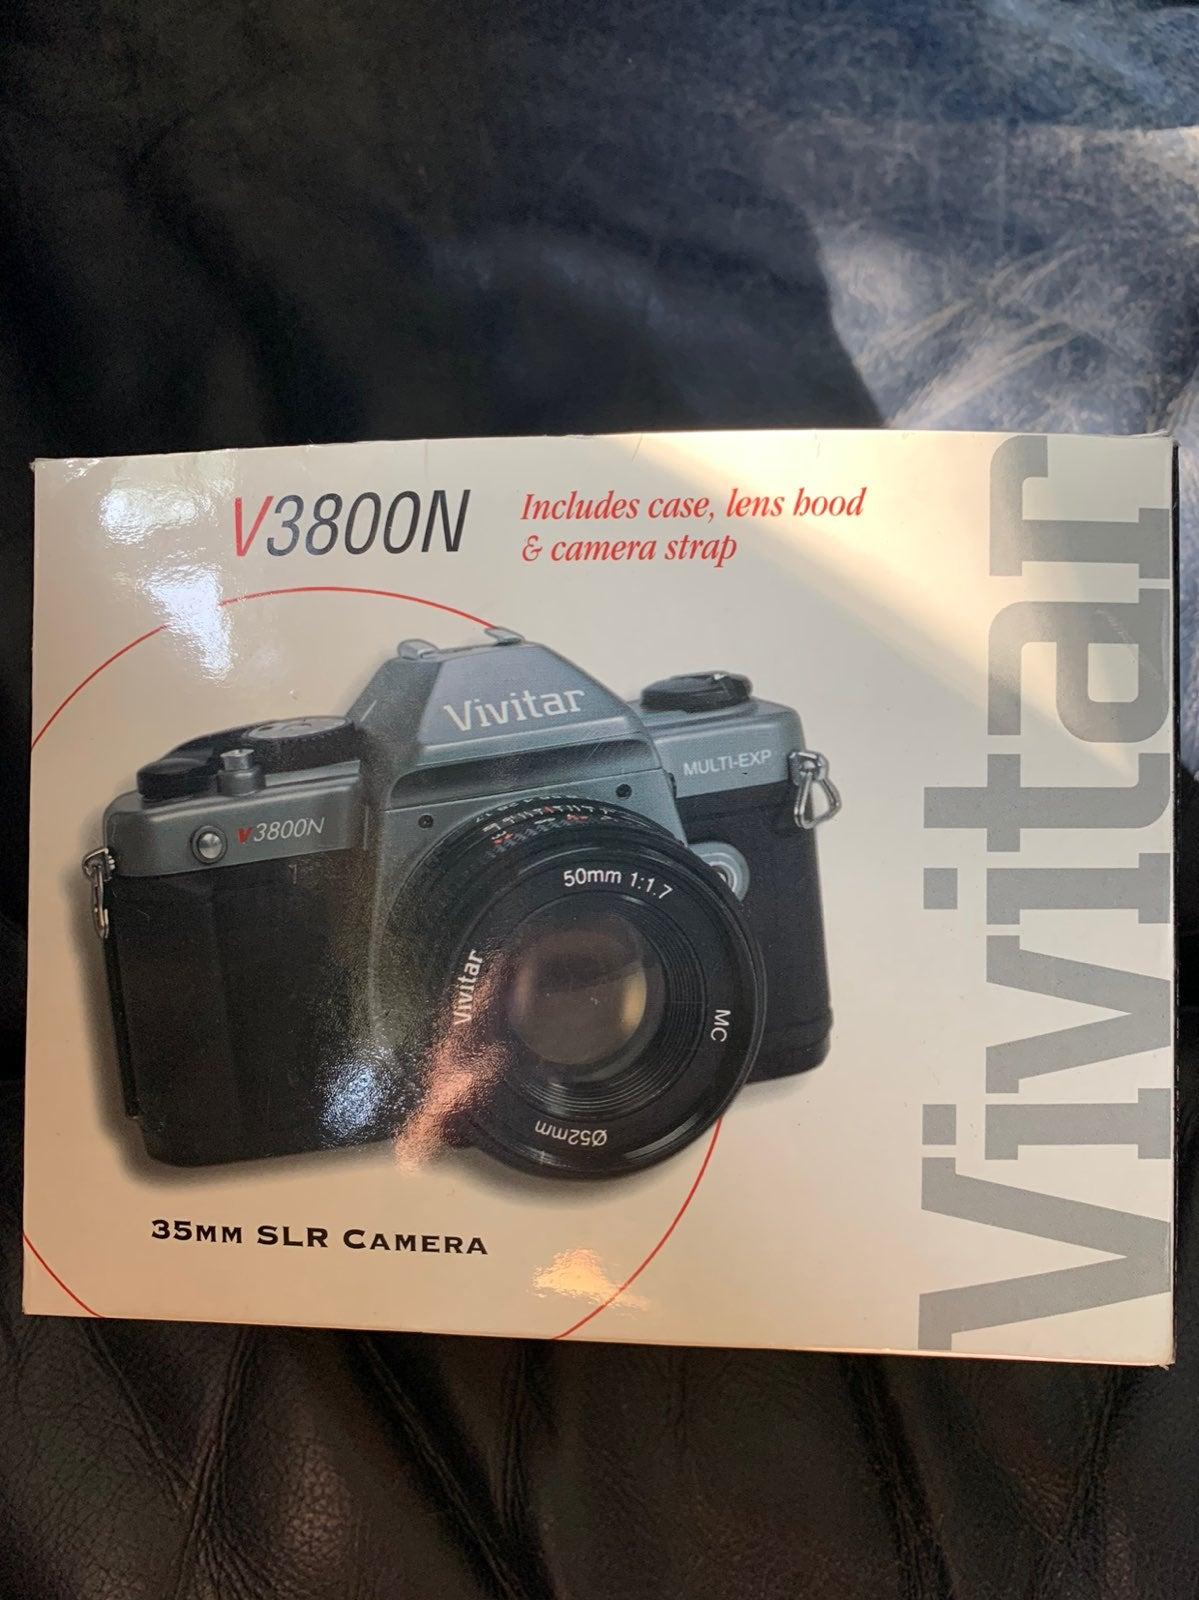 Vivitar 3800n 35mm SLR Camera